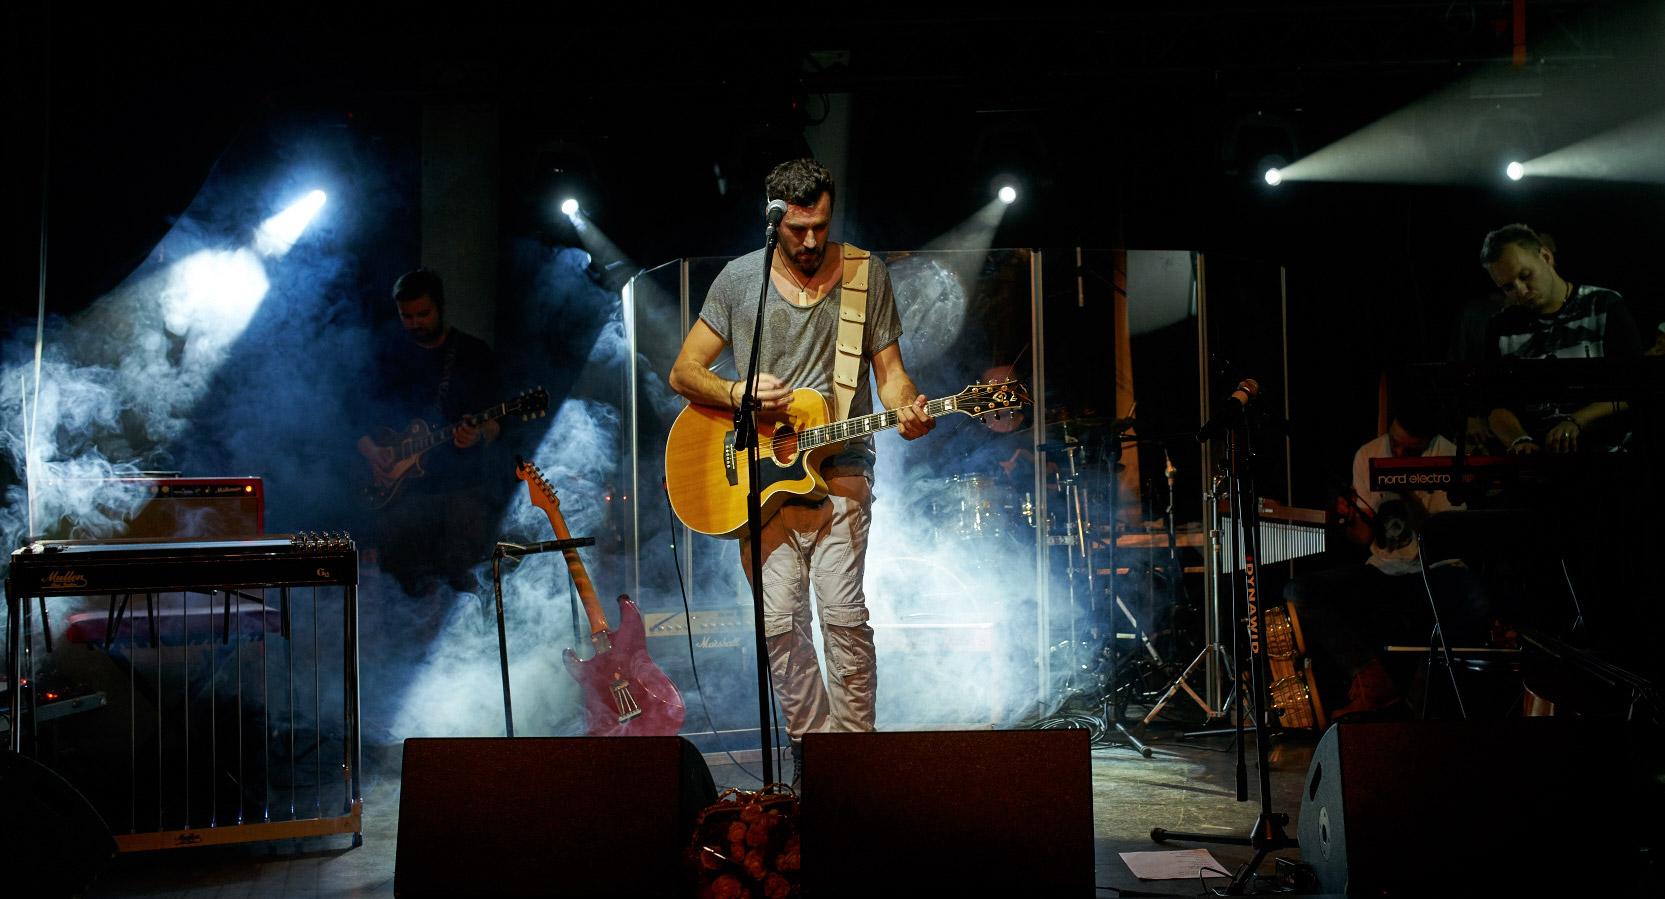 bartek-grzanek-scenografia-2015-008